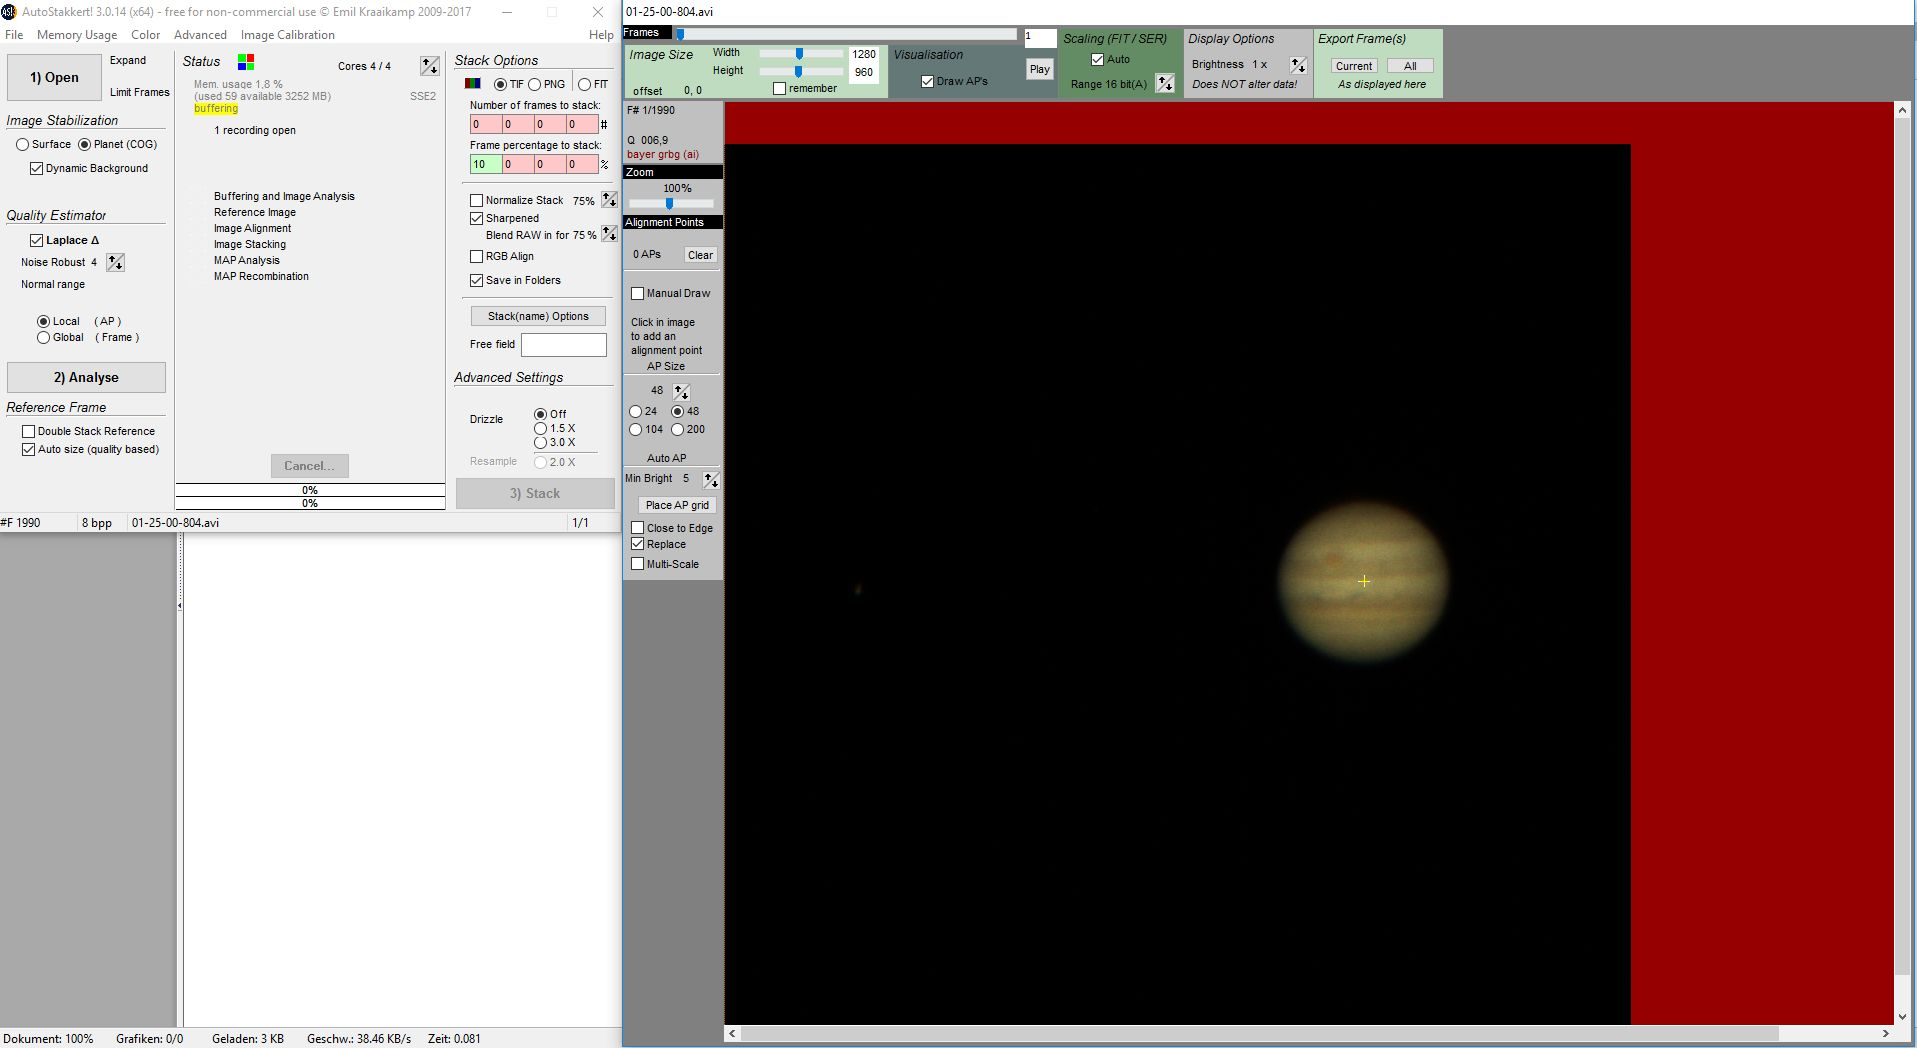 Planetenfotografie mit Planetencam | astropage.eu